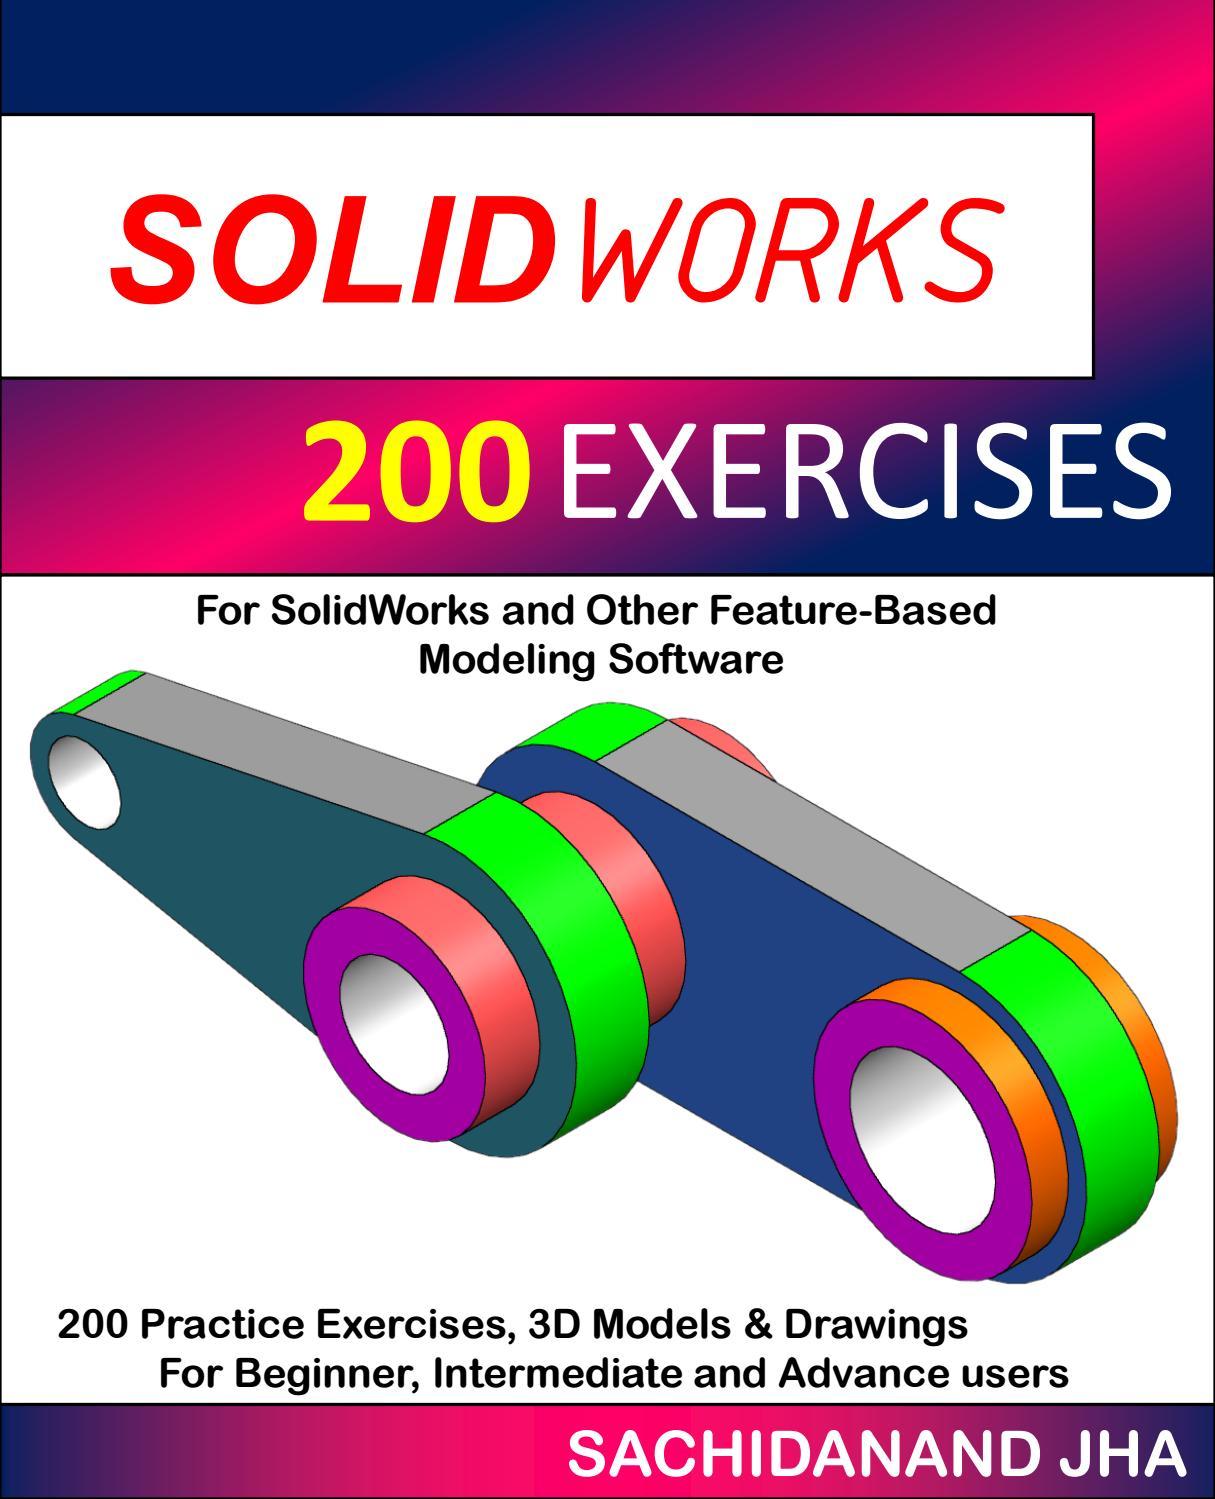 Solidworks Practice Parts : solidworks, practice, parts, Solidworks, Practice, Parts, Sachidanand, Issuu